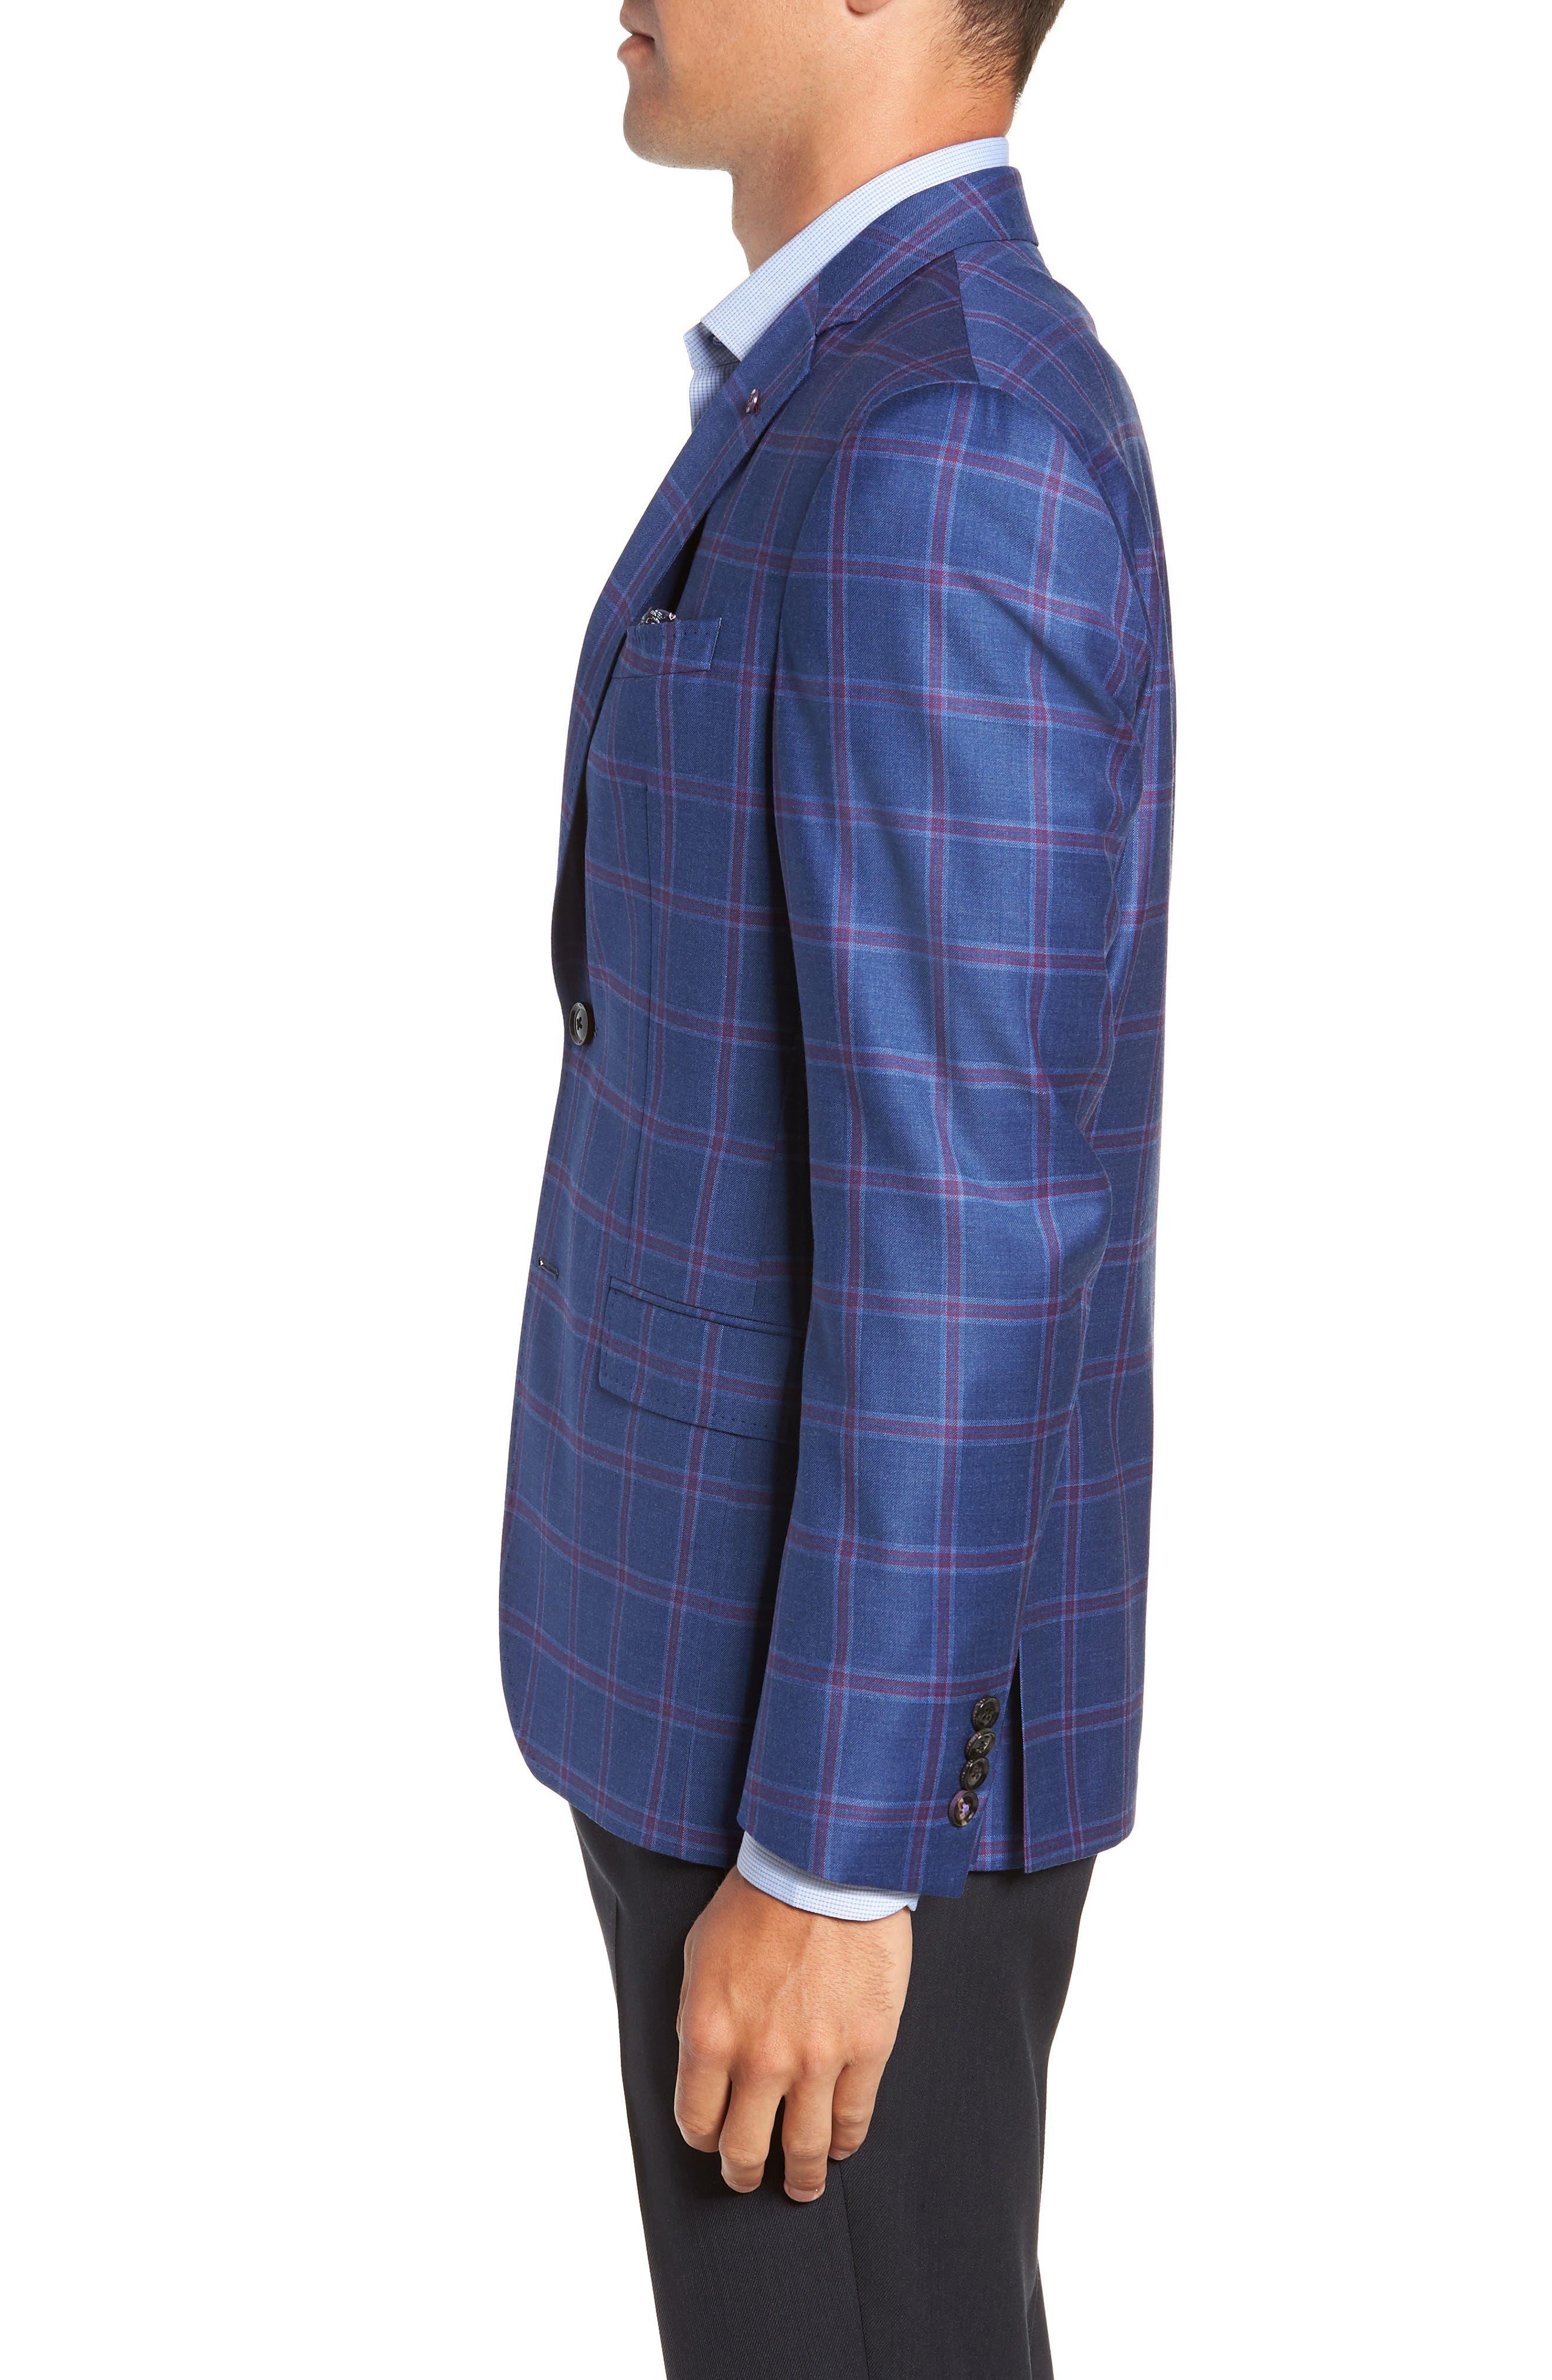 TED BAKER LONDON, Konan Trim Fit Wool Sport Coat, Alternate thumbnail 3, color, BLUE